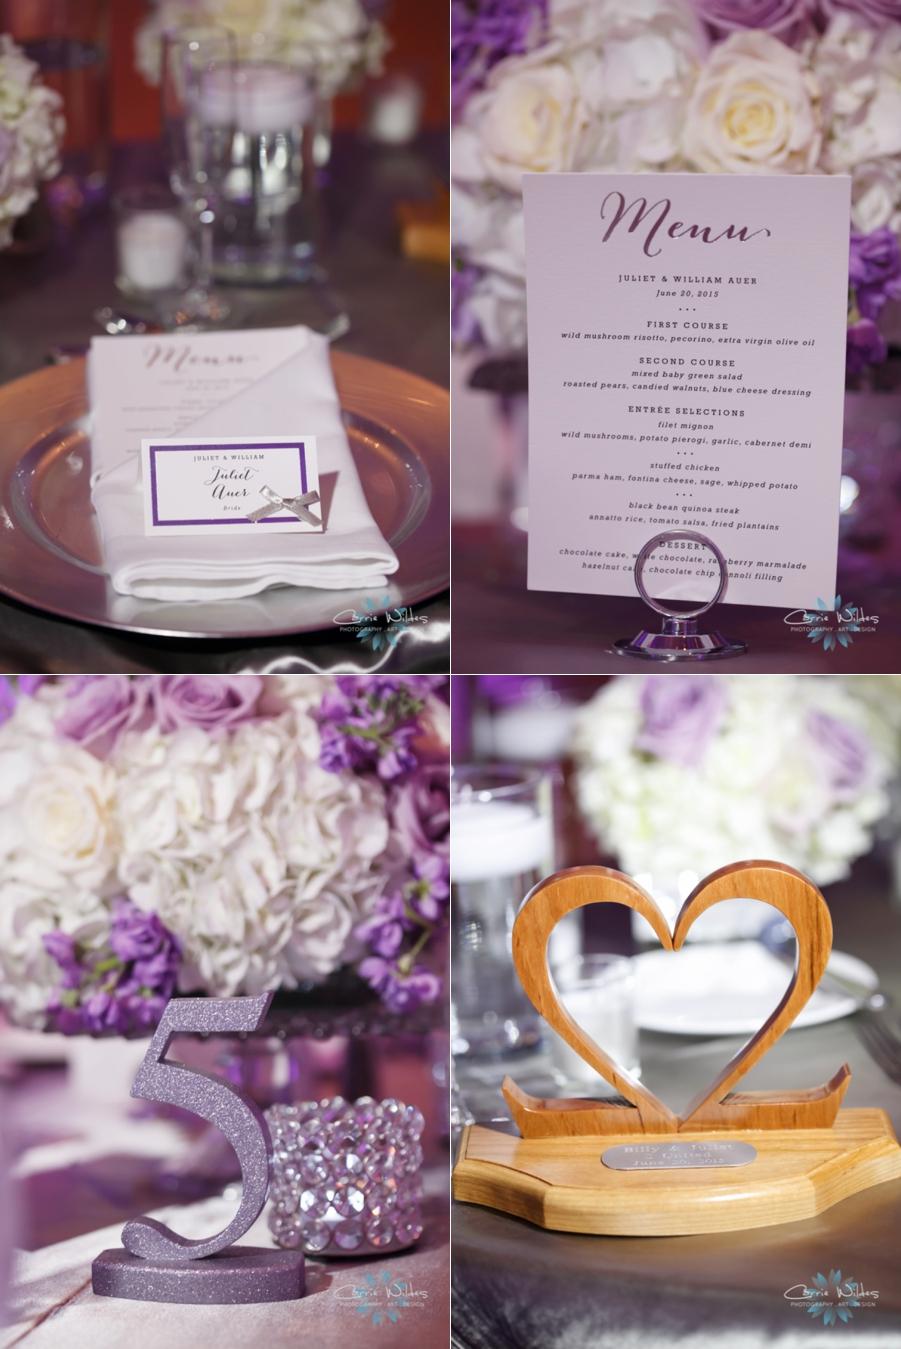 6_20_15 Renaissance Vinoy Wedding_0045.jpg